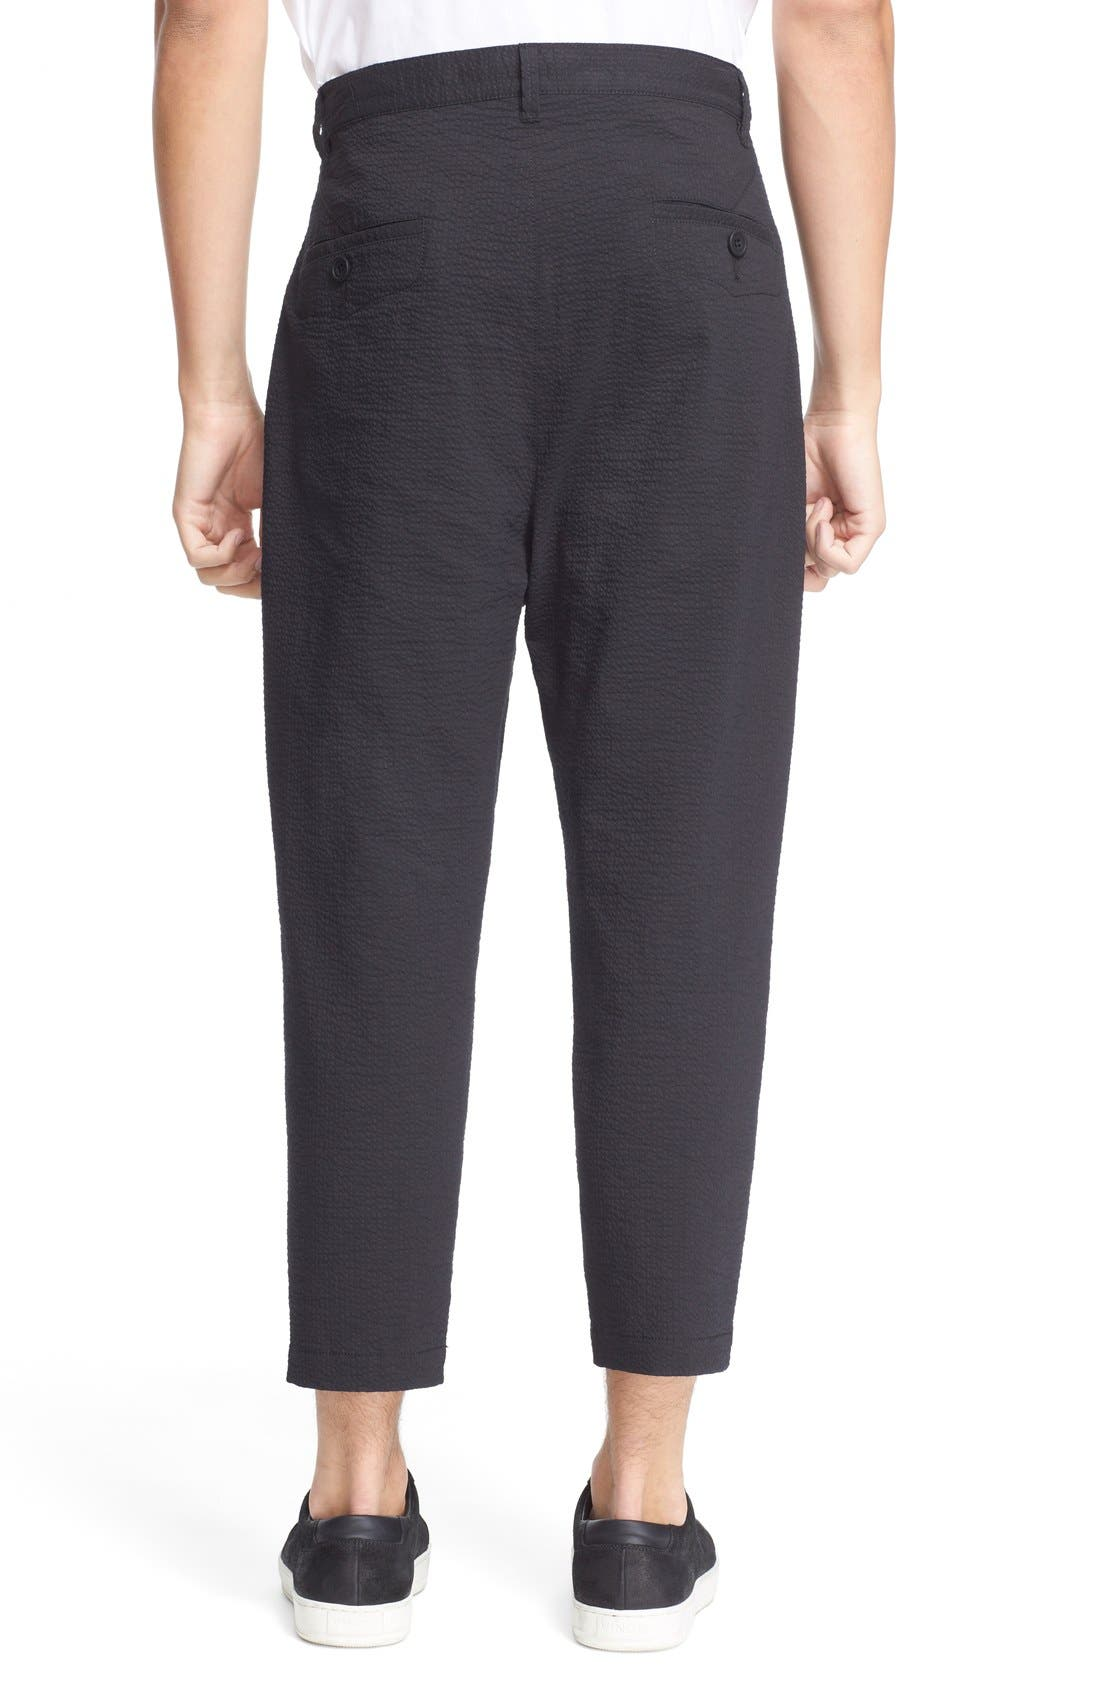 HELMUT LANG, Seersucker Trousers, Alternate thumbnail 5, color, 001